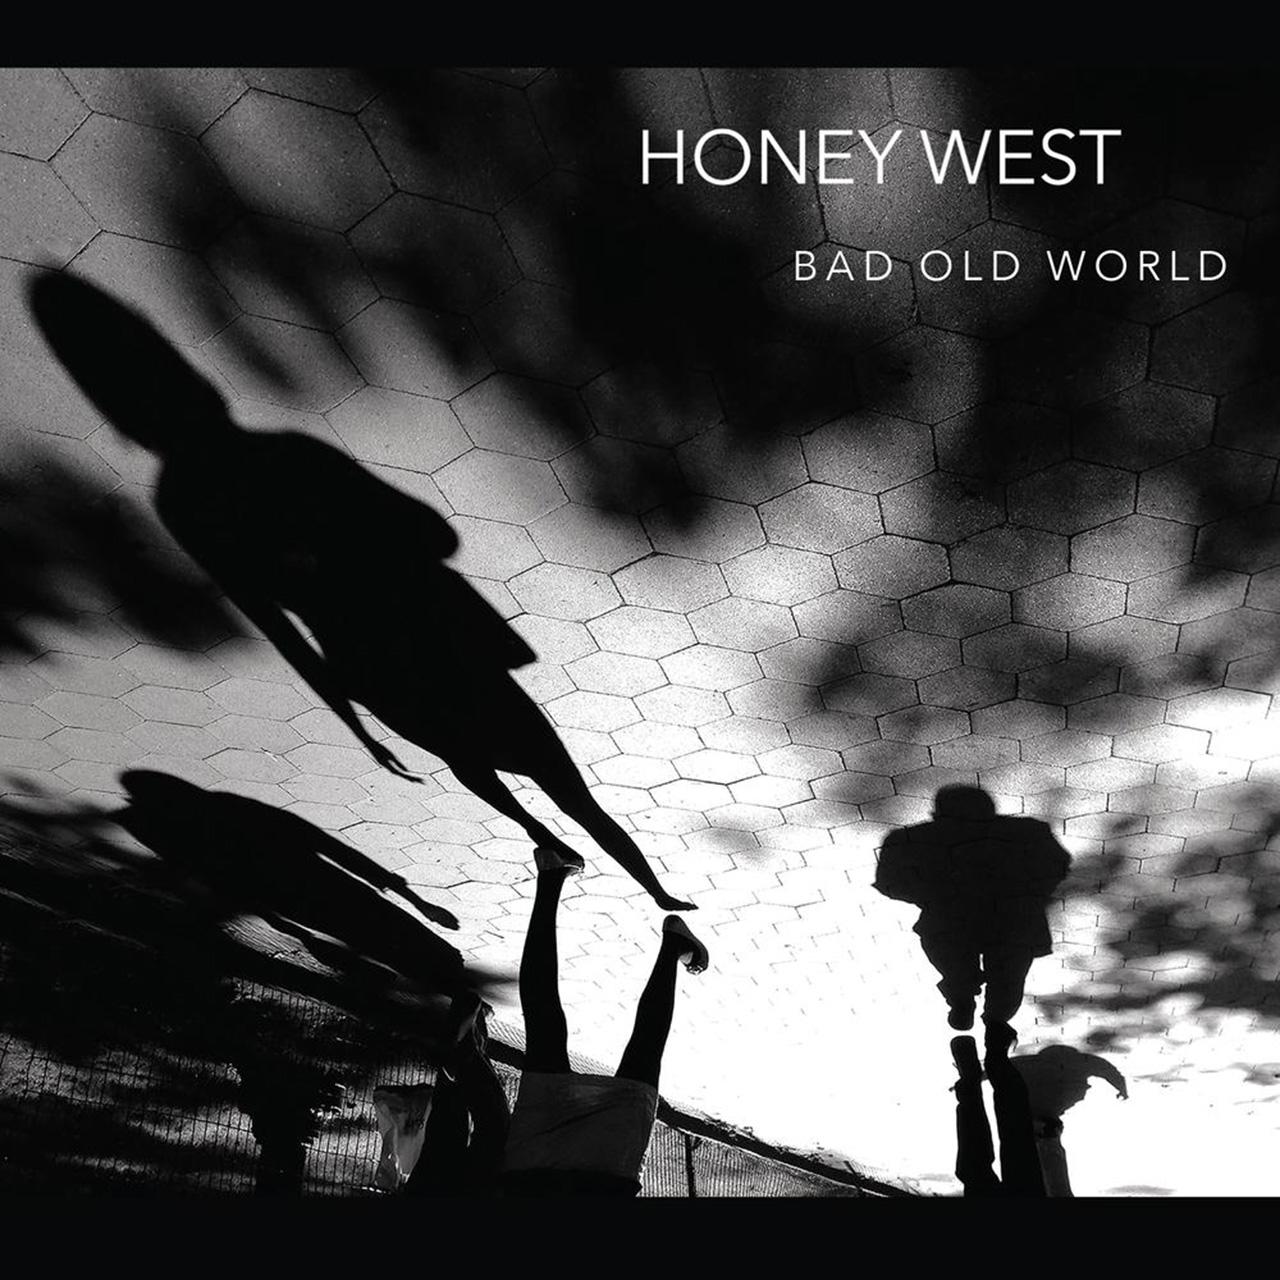 King Crimson ex Ian McDonald to reissue Honey West's debut album on vinyl | Louder